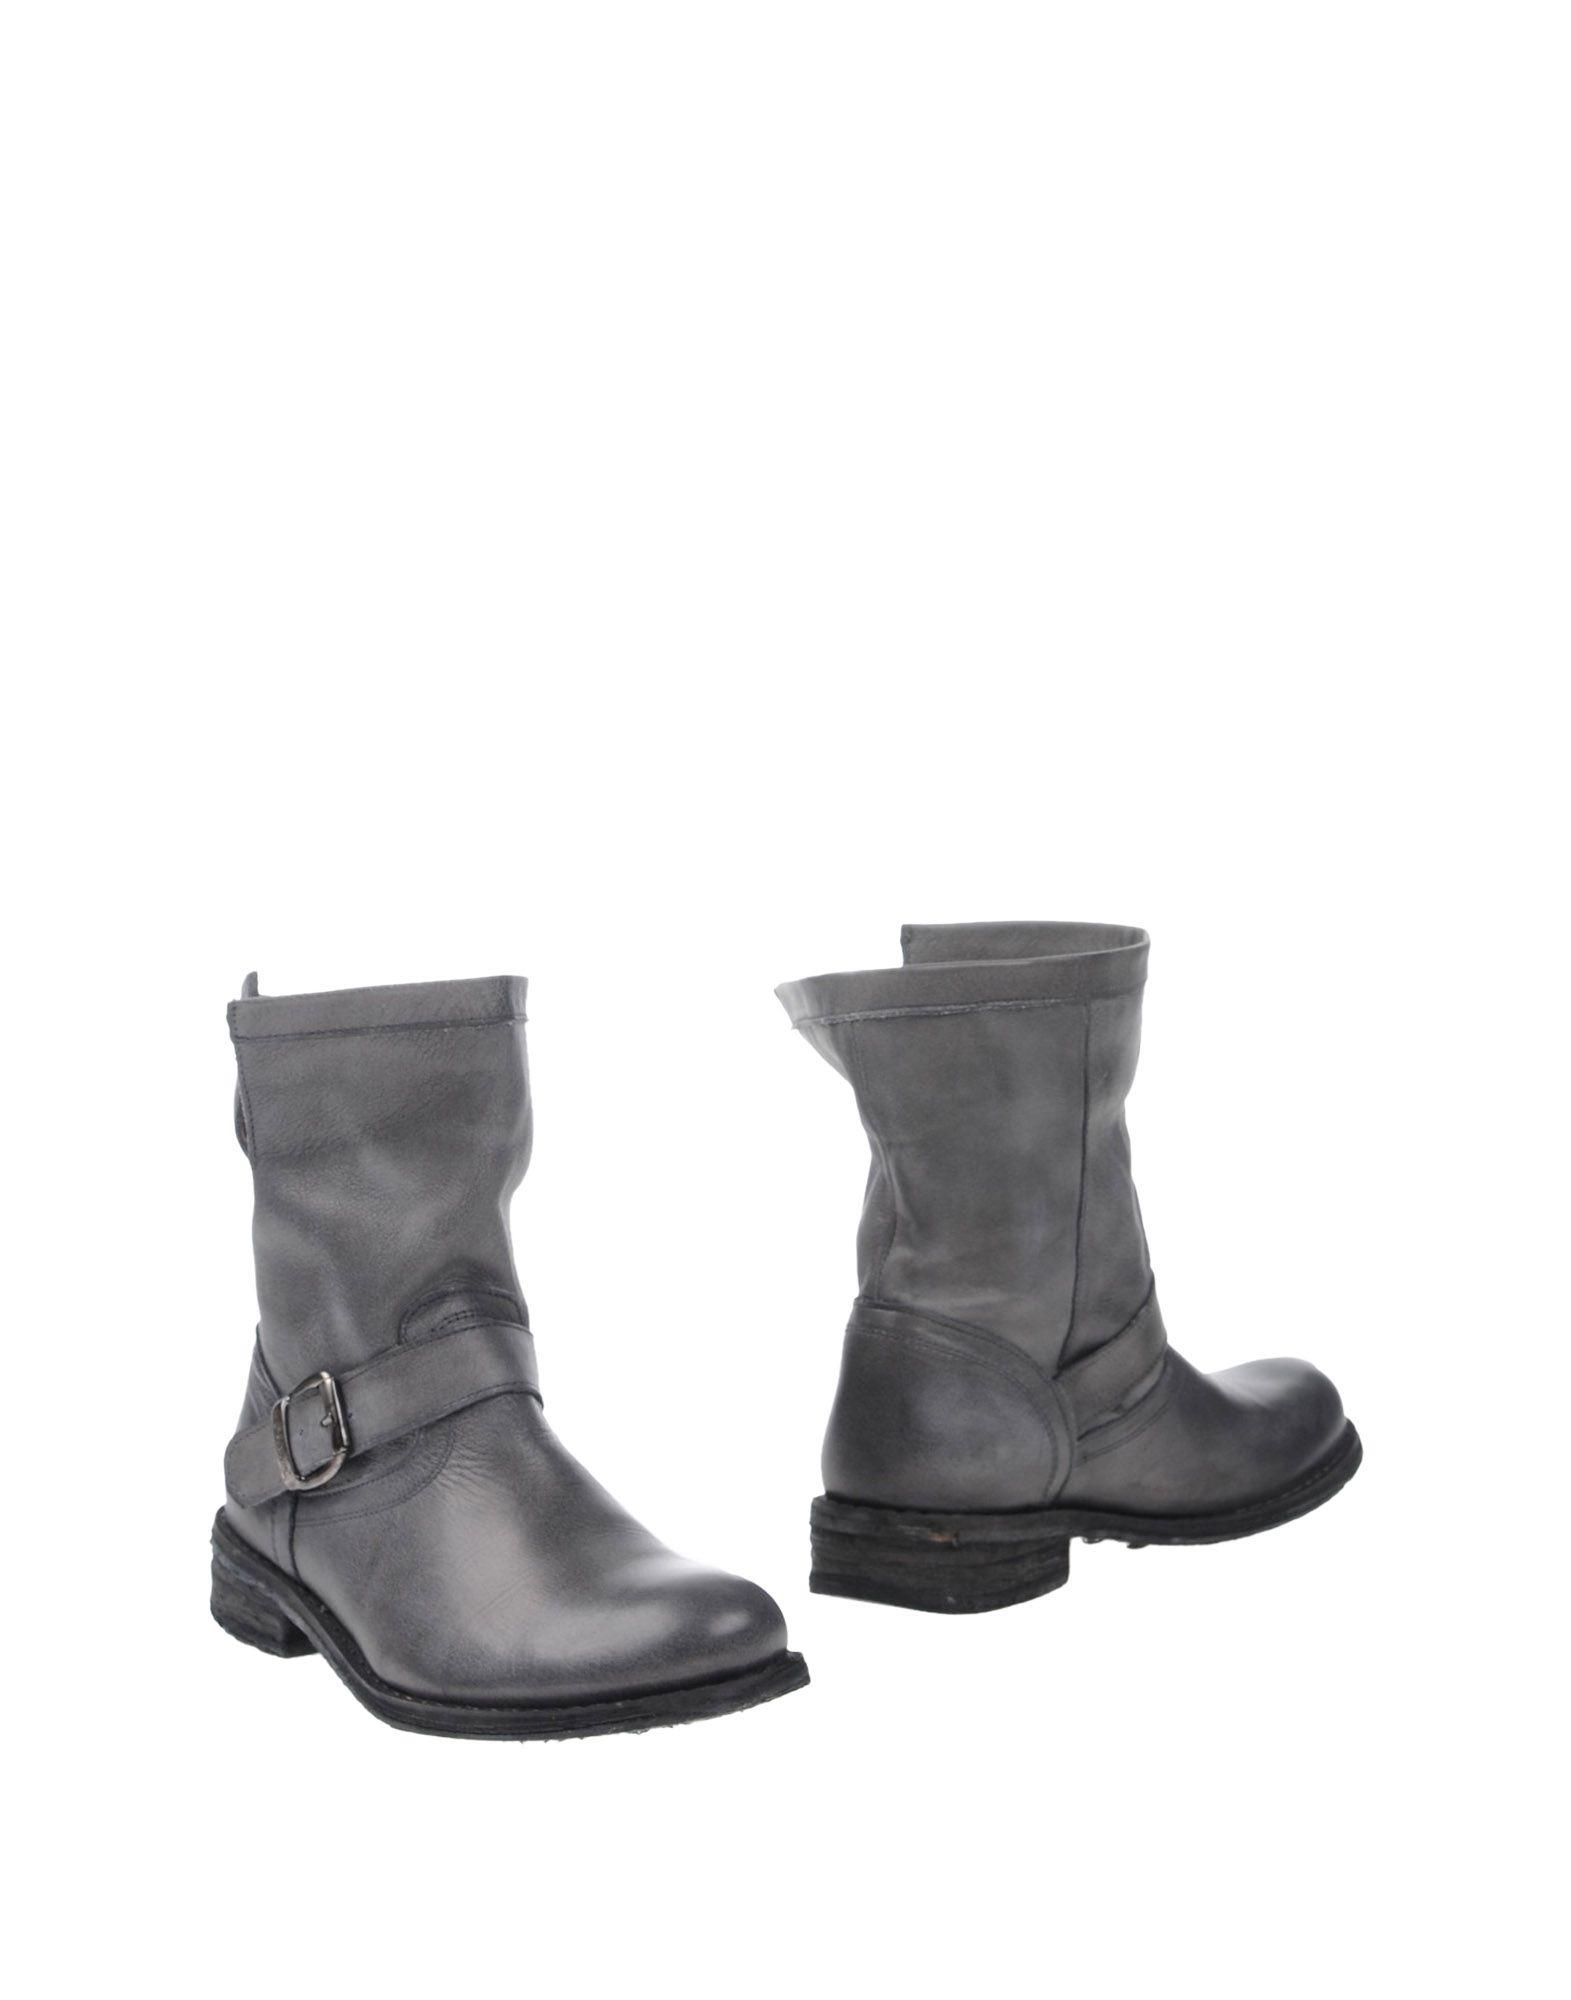 Felmini Stiefelette Damen  11266822LN Gute Qualität beliebte Schuhe